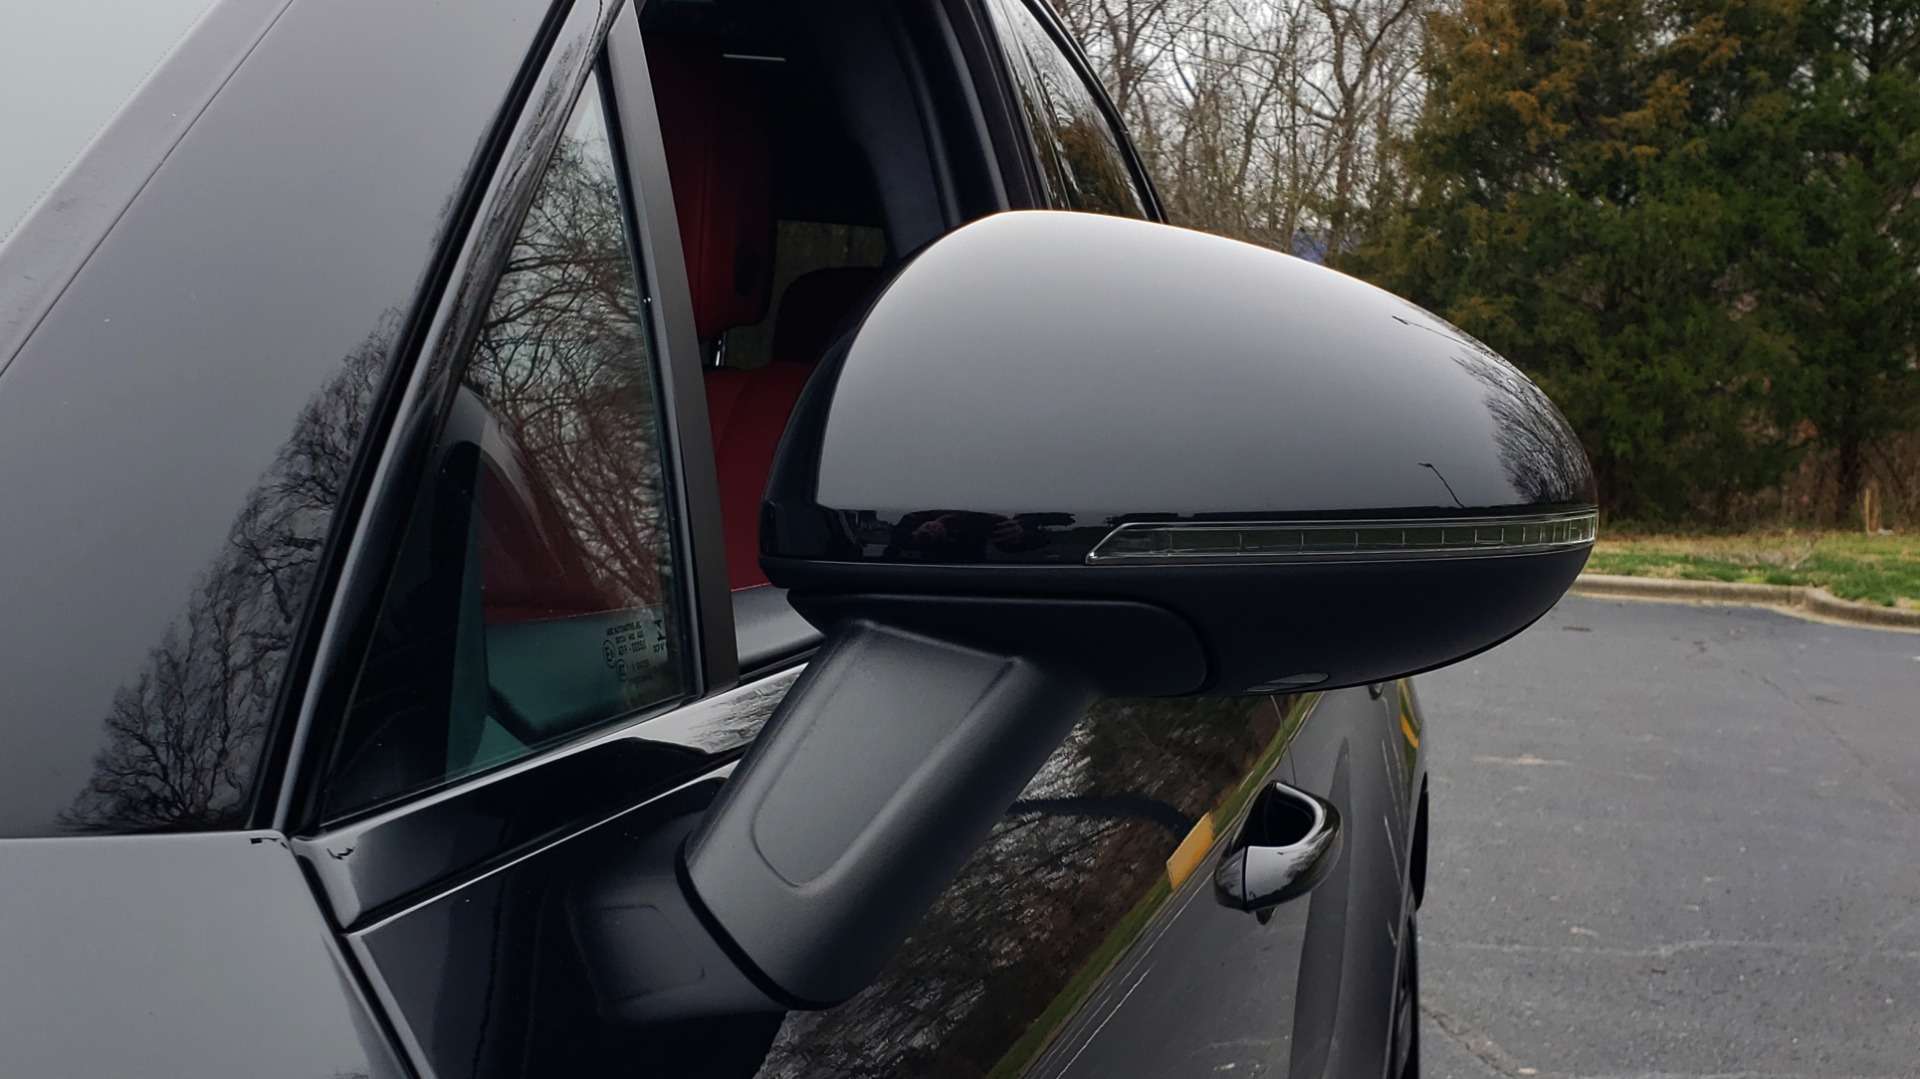 Used 2016 Porsche MACAN TURBO / PREM / NAV / PARK ASST / BOSE / PDK / CHRONO PKG for sale Sold at Formula Imports in Charlotte NC 28227 34